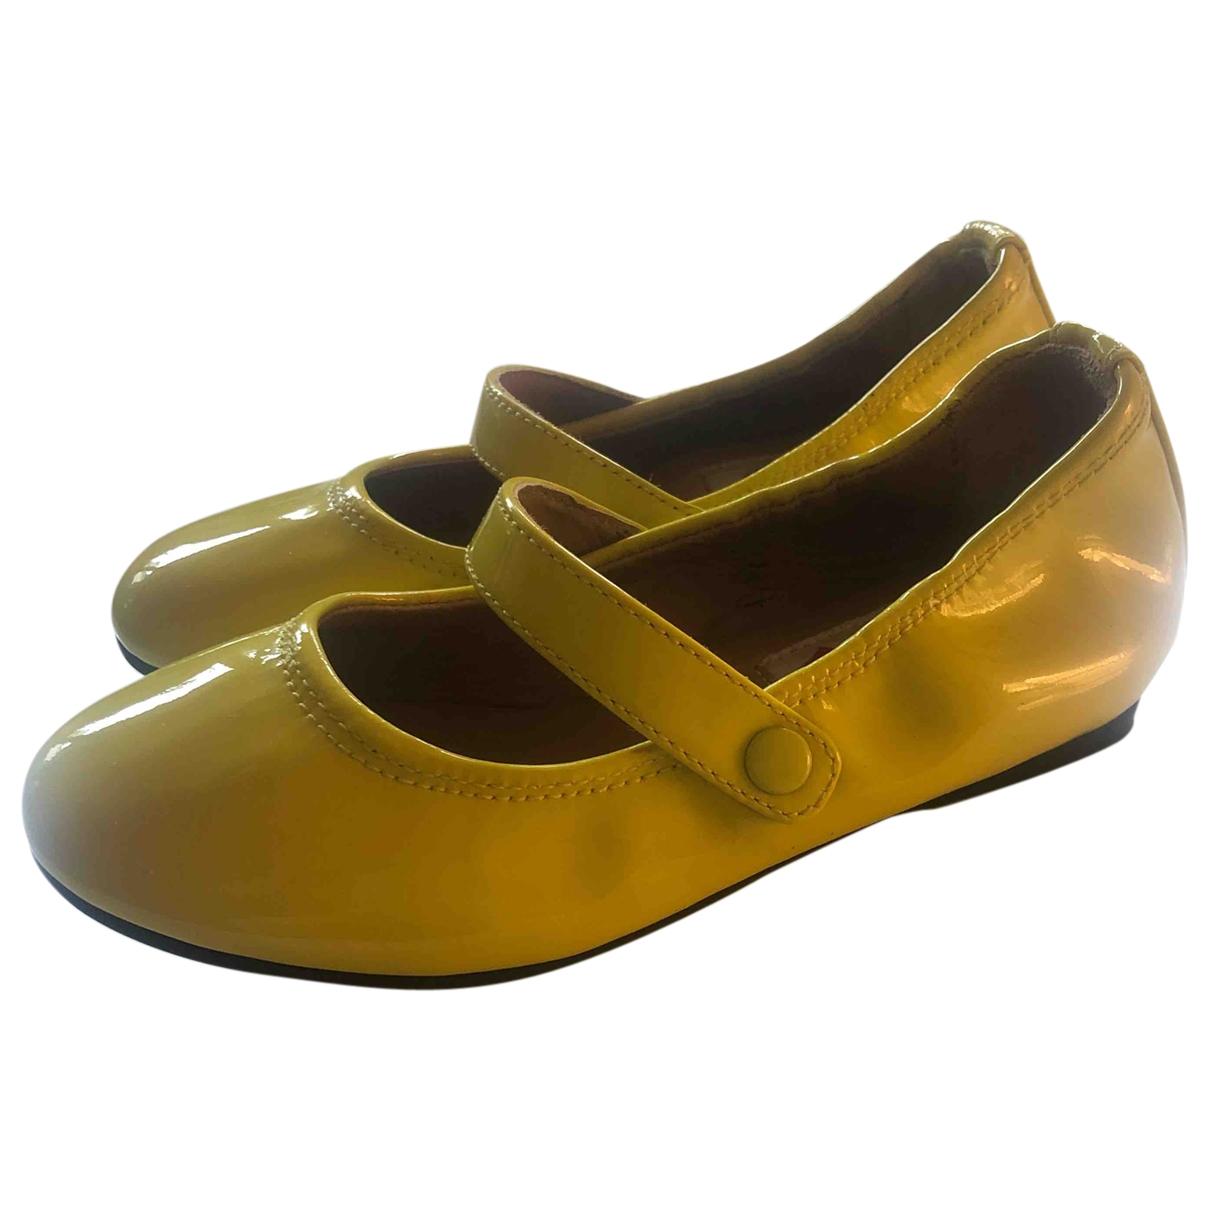 Lanvin \N Yellow Patent leather Ballet flats for Kids 26 EU